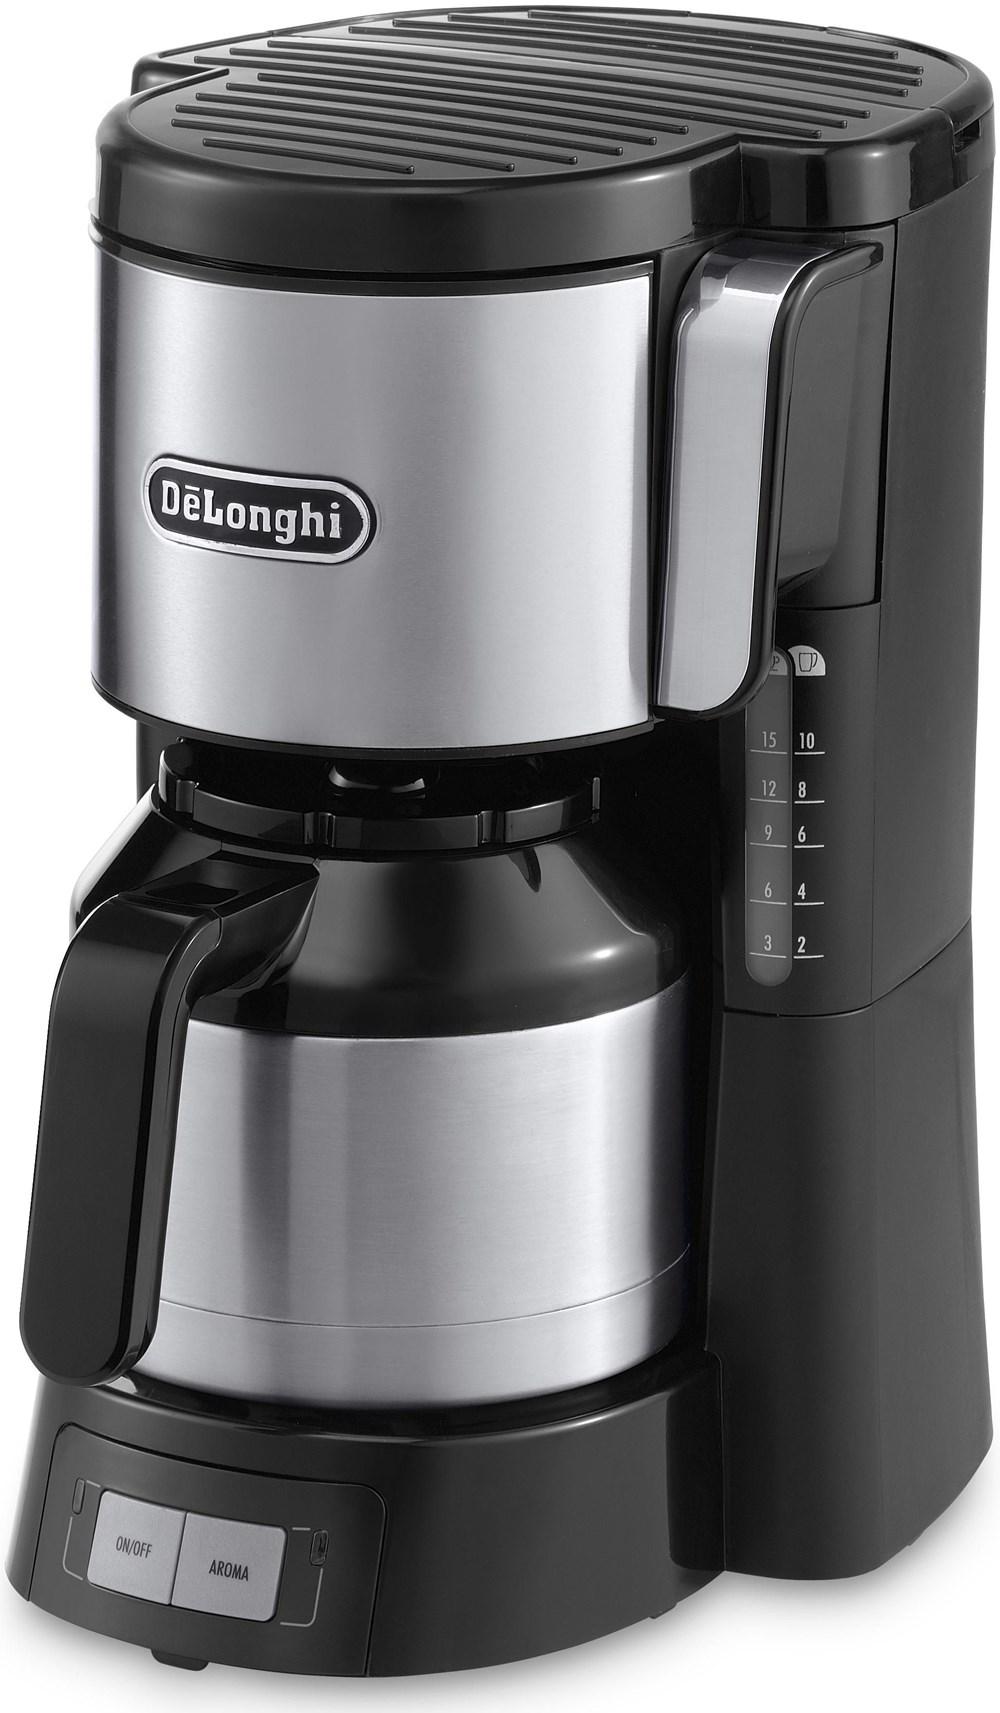 DeLonghi Filterkaffeemaschine ICM 15740 silber/schwarz